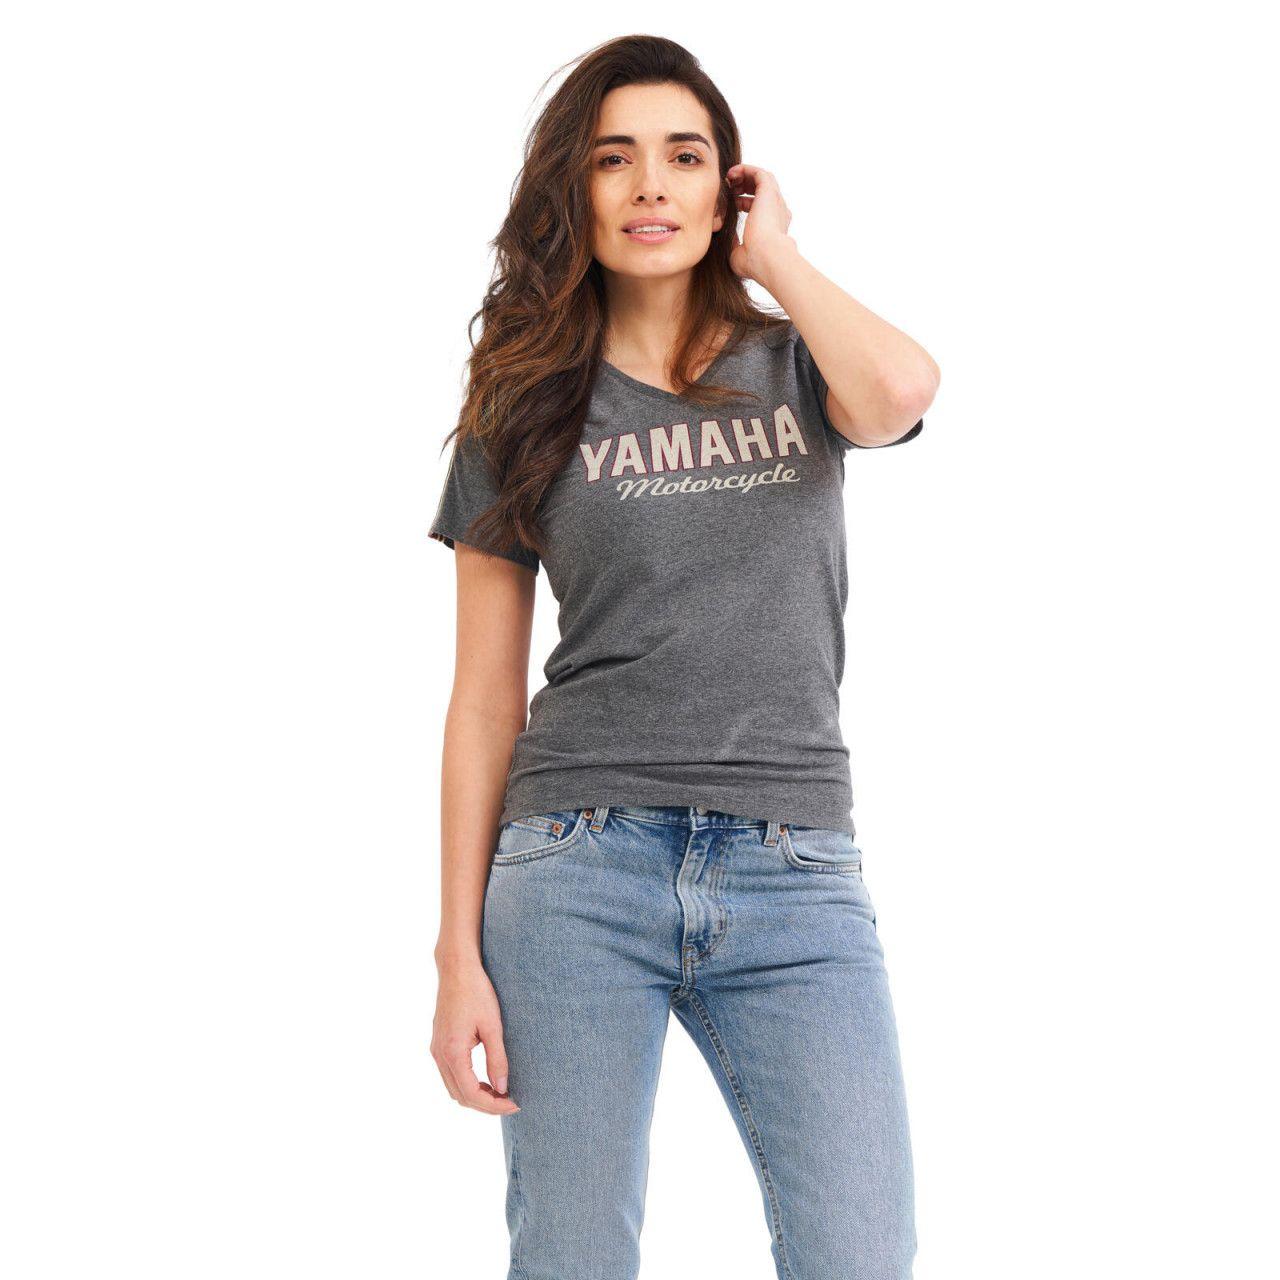 YAMAHA T-shirt femme Faster Sons gris 2021